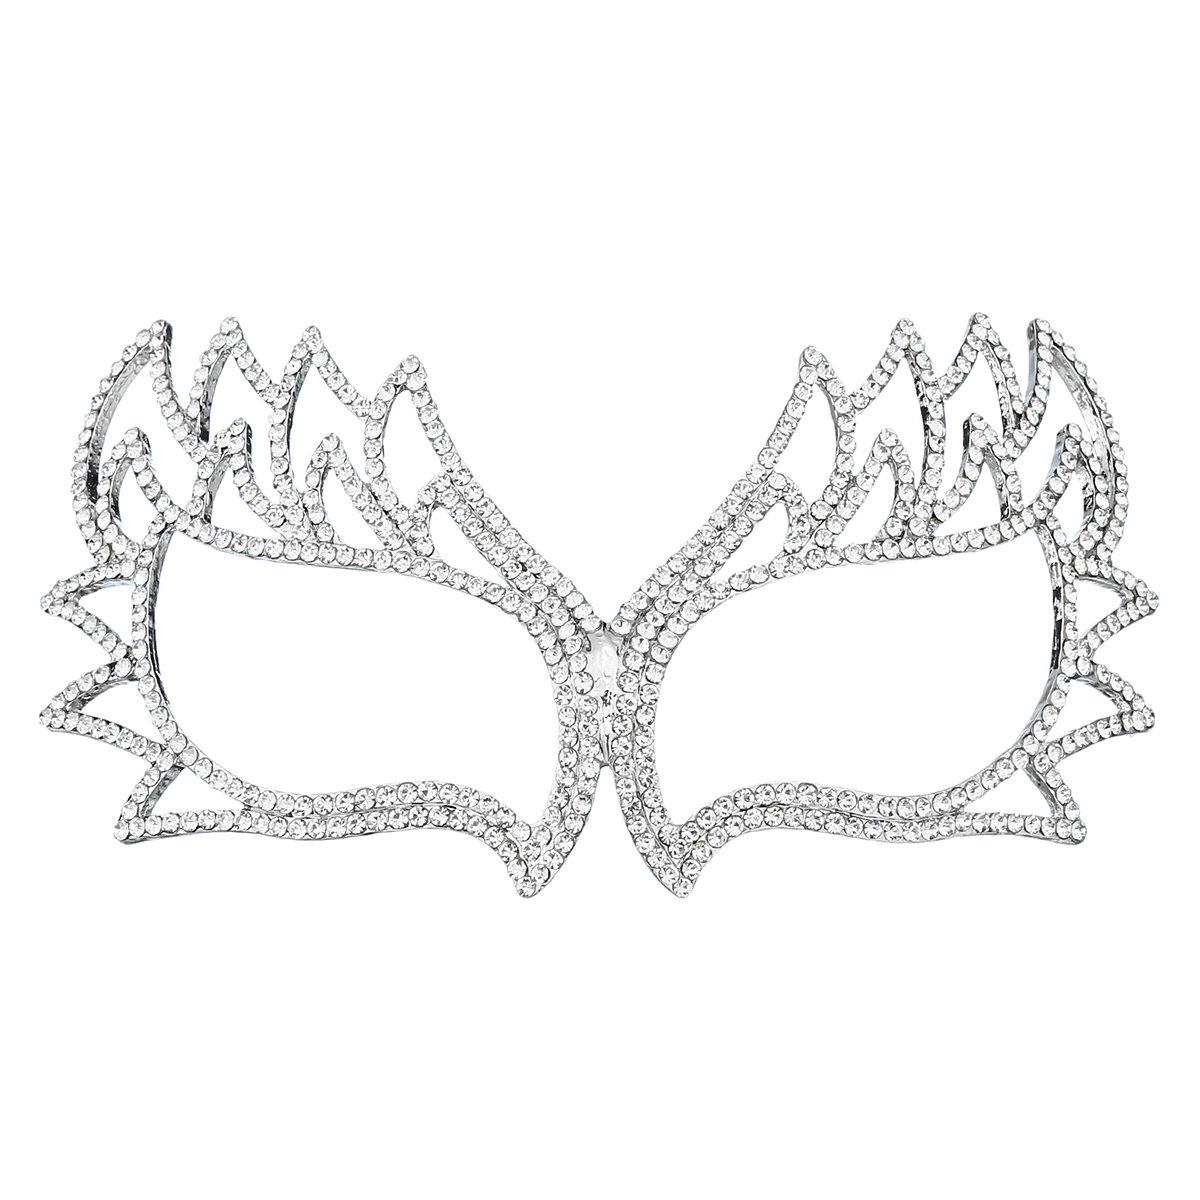 Miallo Bridal Full Rhinestone Crystal Fancy Masquerade Eye Mask for Halloween (Style2#)